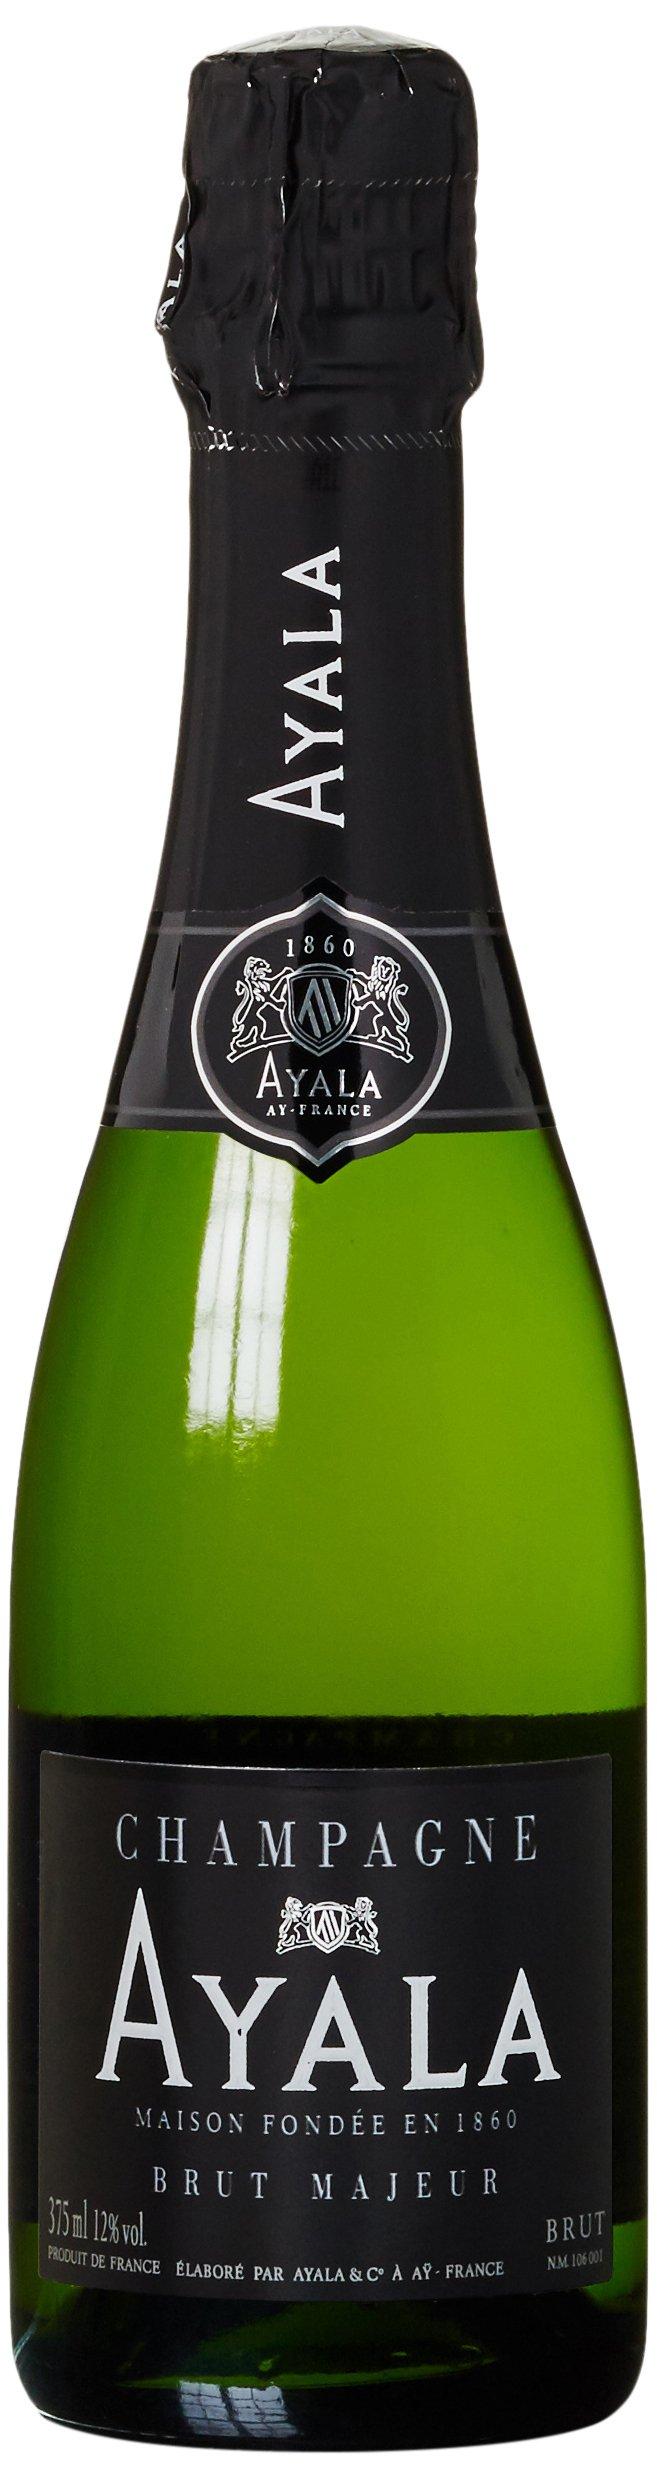 Ayala-Brut-Majeur-Champagner-1-x-0375-l